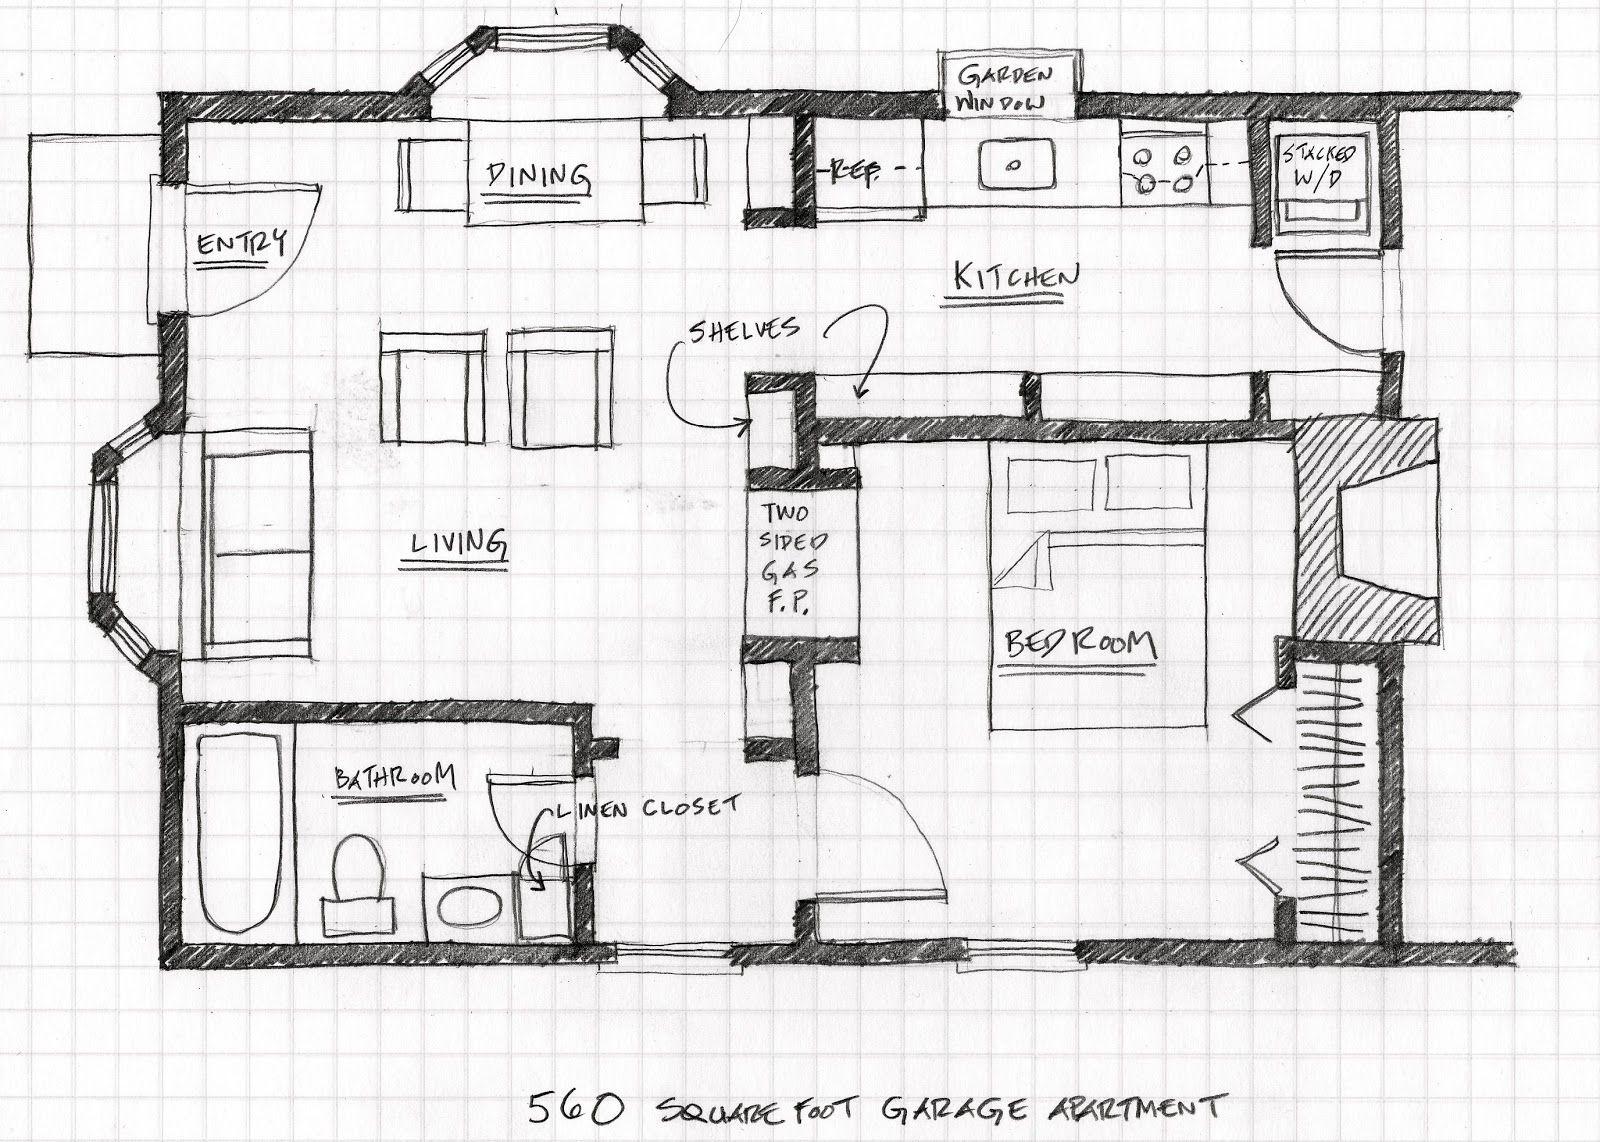 Magnificent 17 Best Ideas About Garage Floor Plans On Pinterest Carriage Largest Home Design Picture Inspirations Pitcheantrous